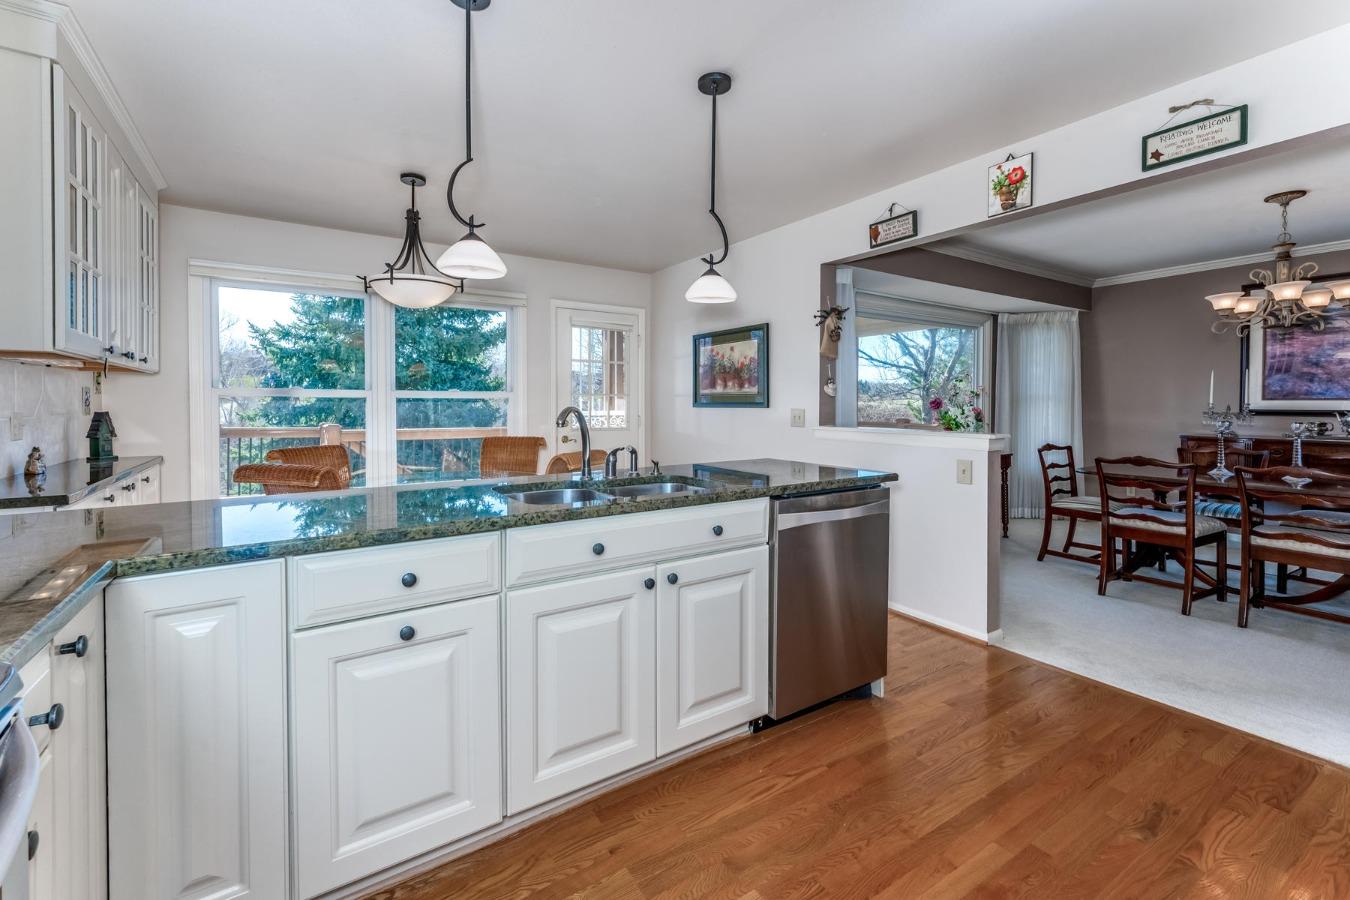 Nice Sized Kitchen with Abundant Cabinet Storage